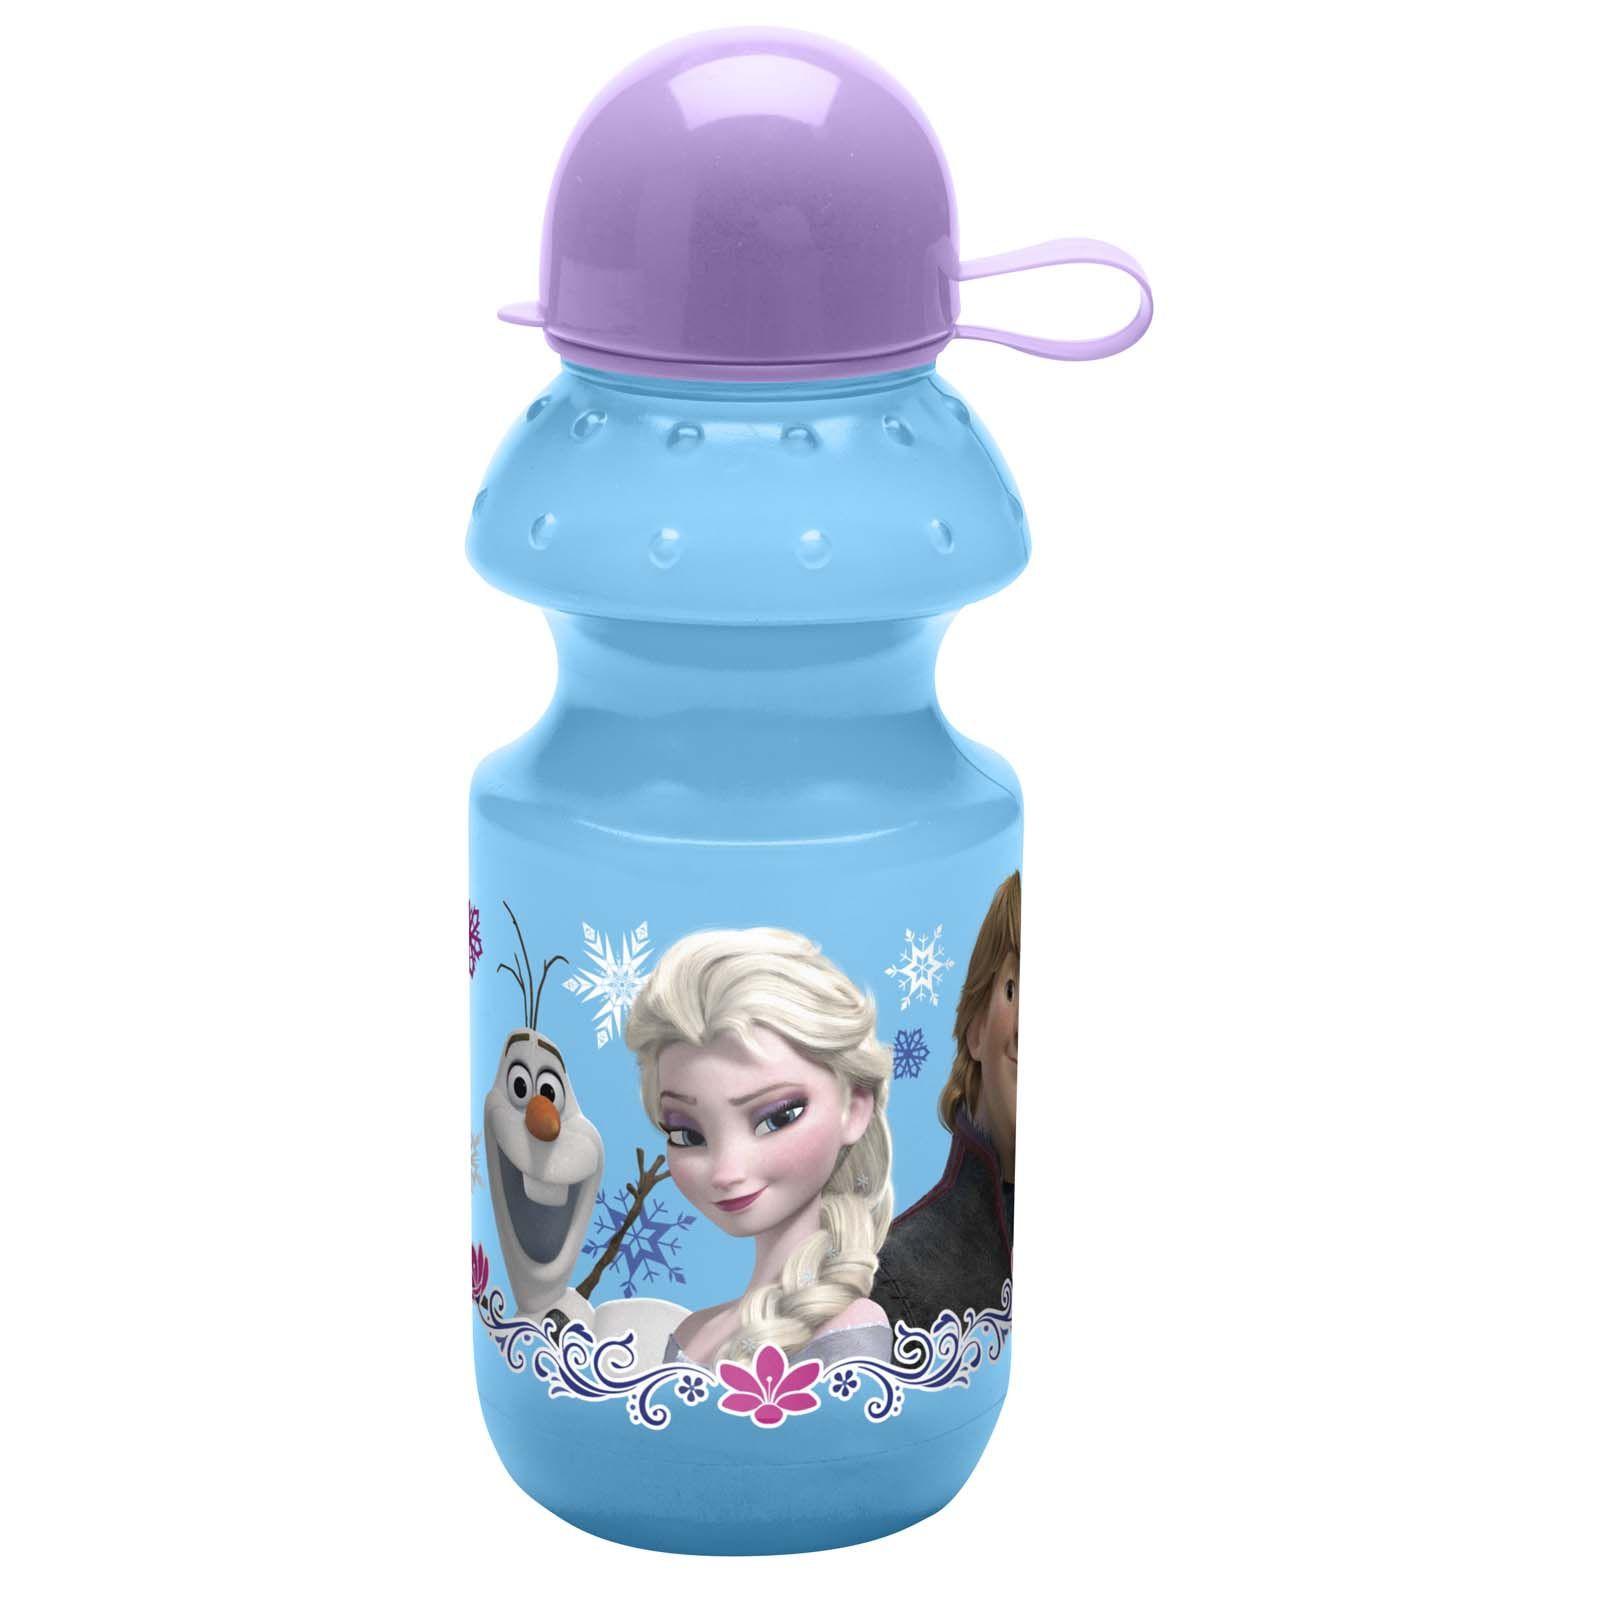 Disney Frozen Plastic Tumbler Water Bottle X2 ZAK Party favor stocking stuffer